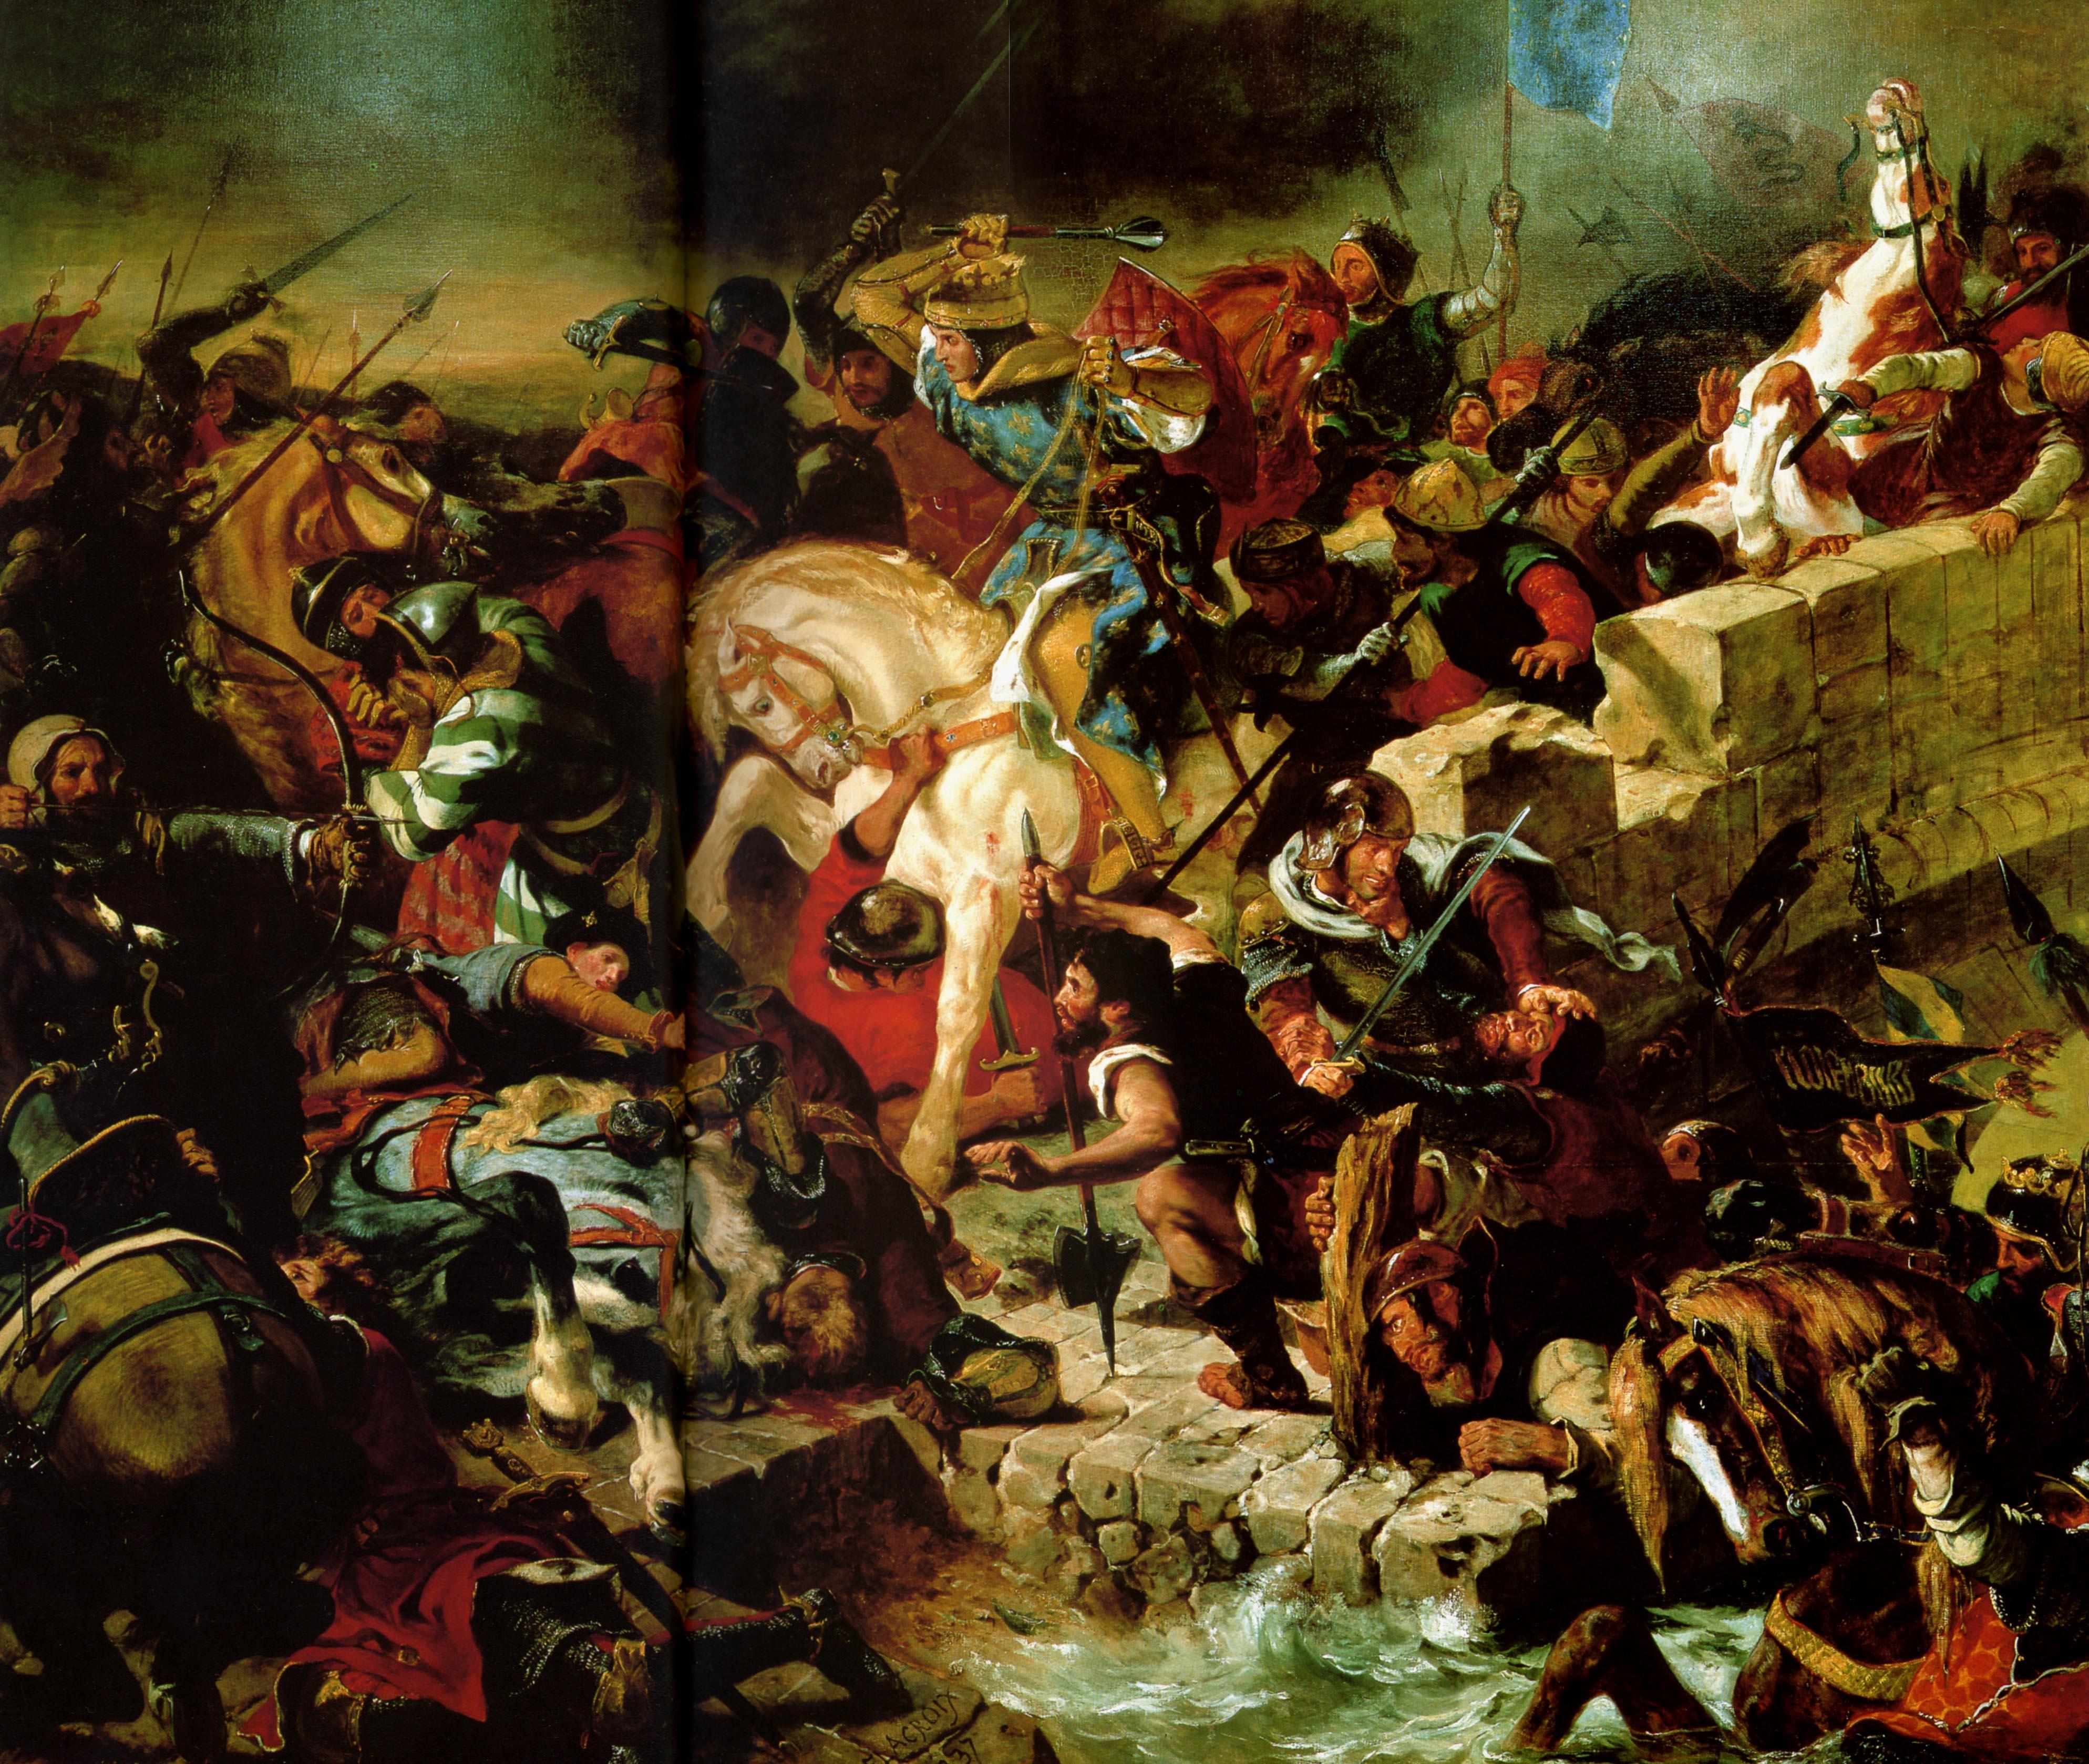 Эжен Делакруа | XIXe | Eugene Delacroix (190 работ): nevsepic.com.ua/art-i-risovanaya-grafika/page,2,10118-ezhen...